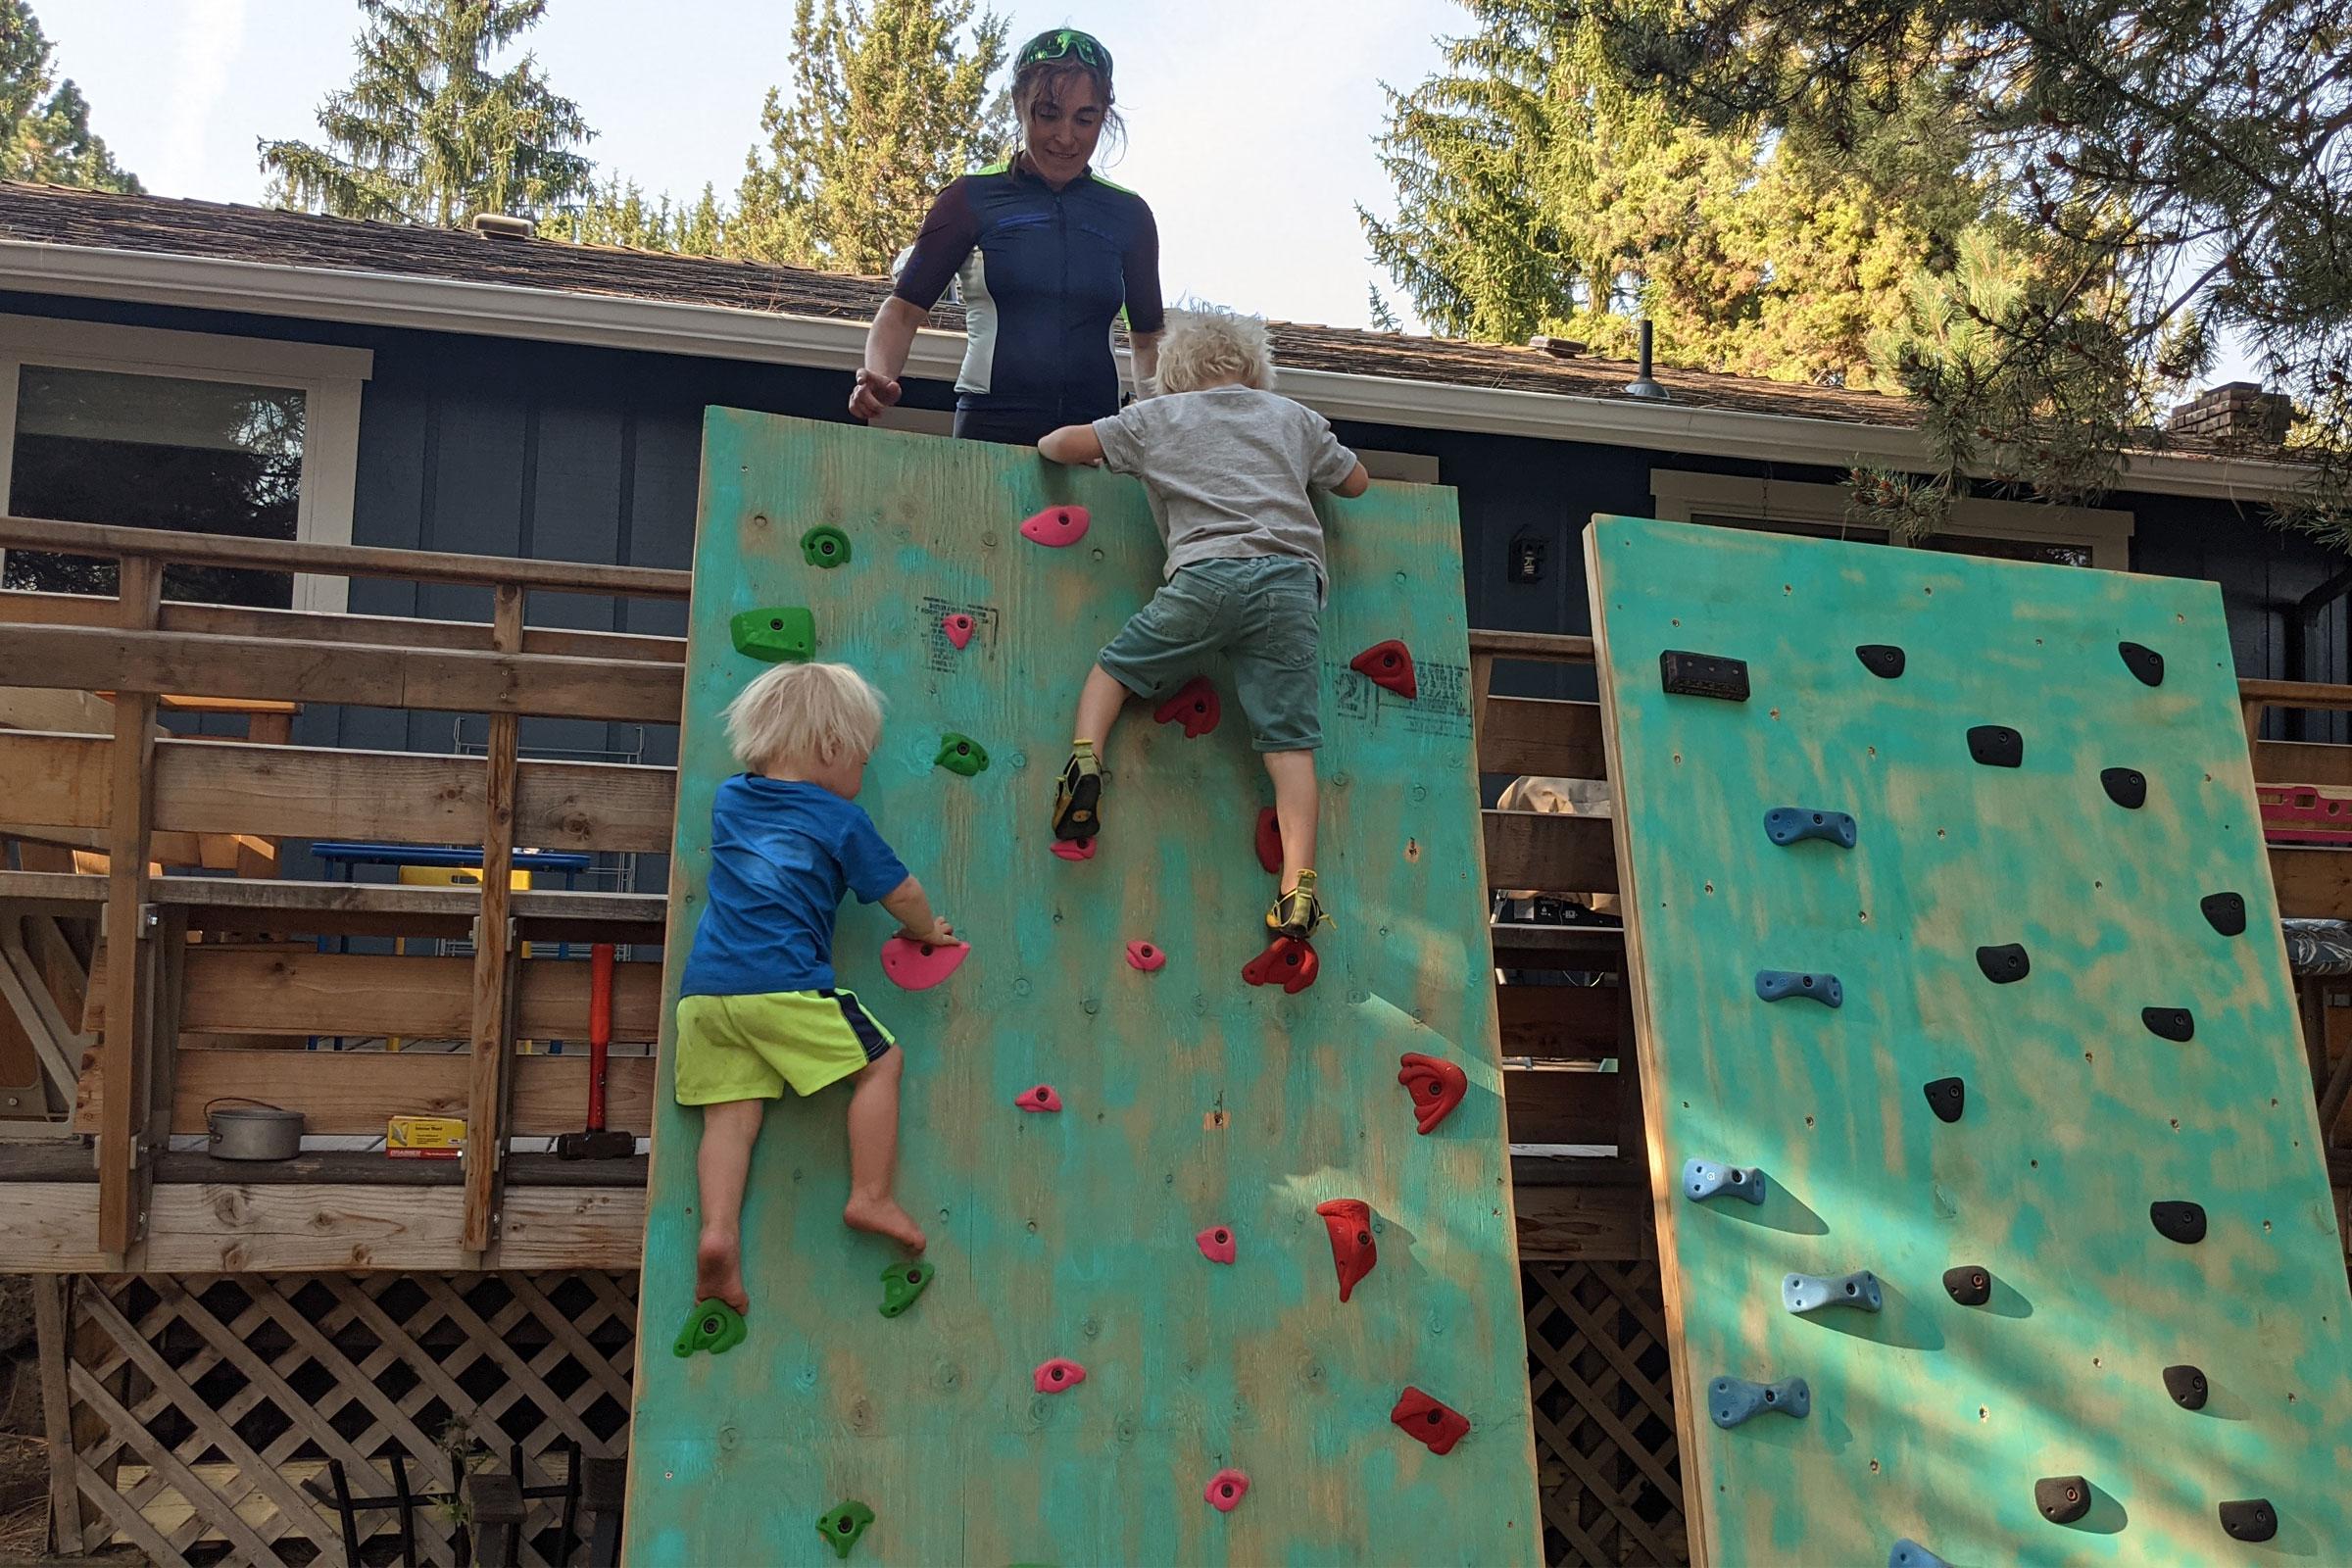 dyi kids climbing wall